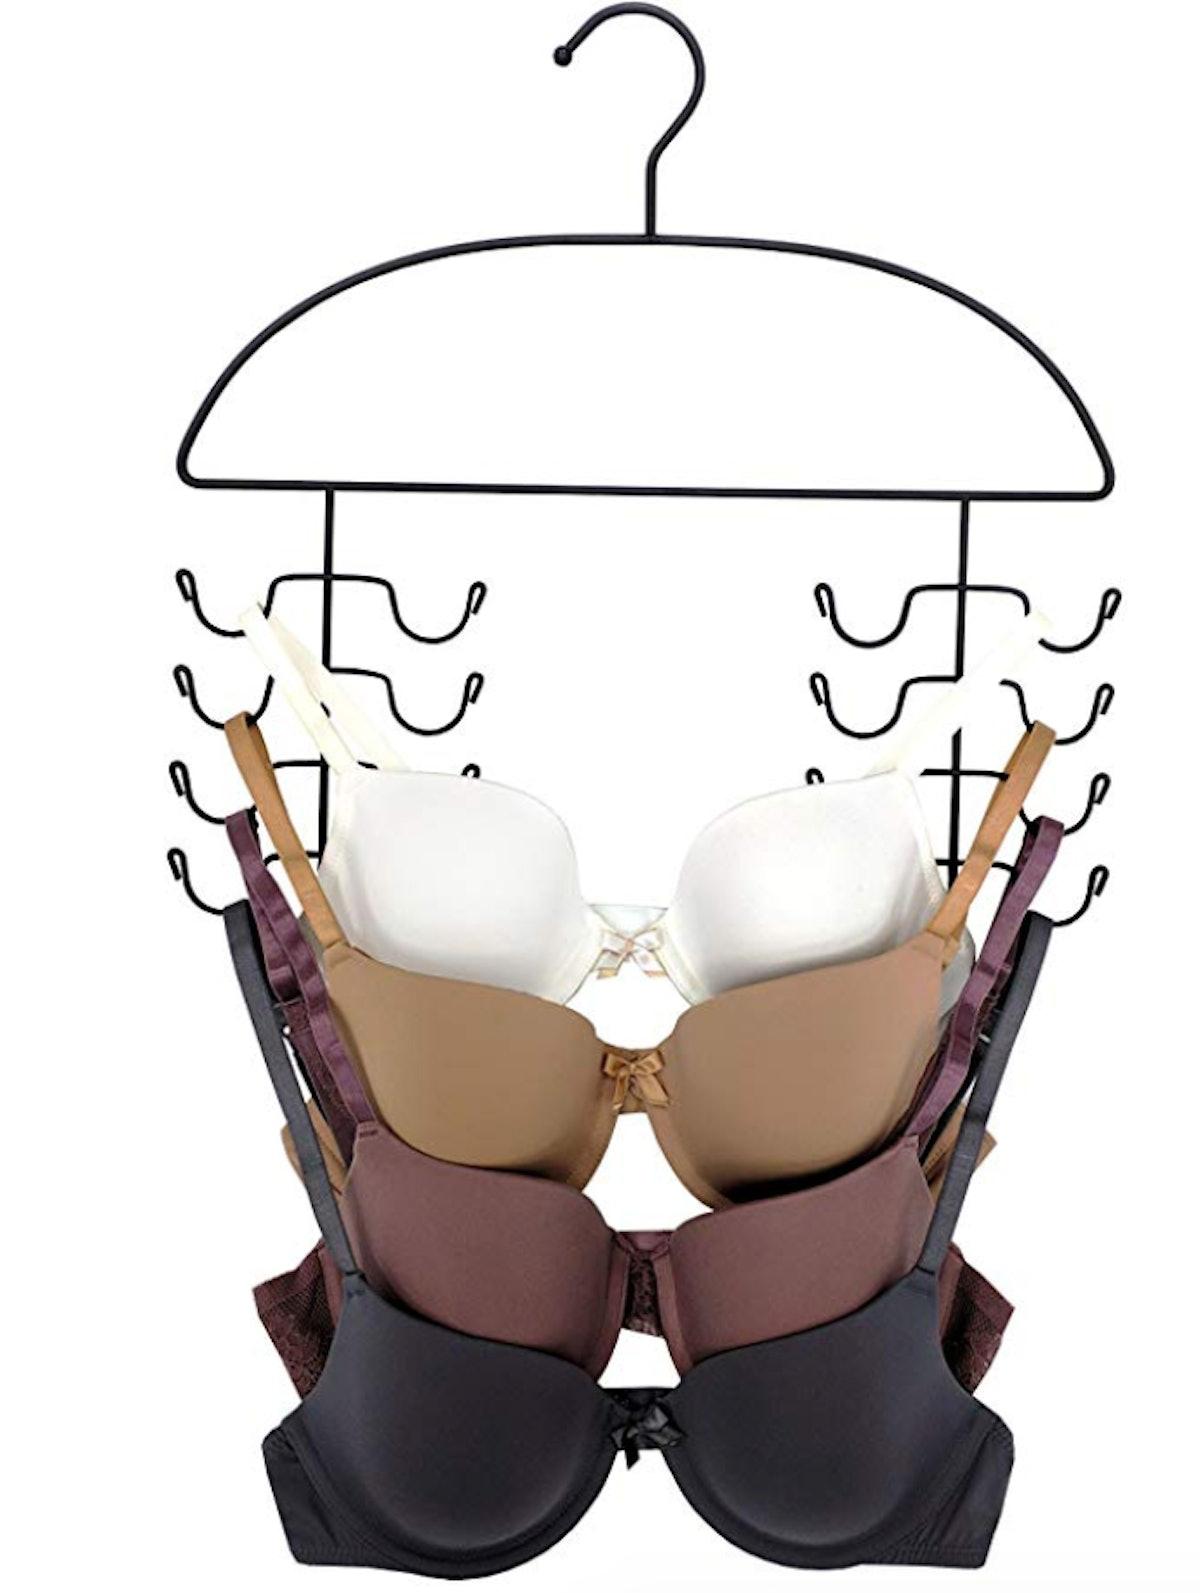 DR. ORGANIZER Hanger (2-Pack)